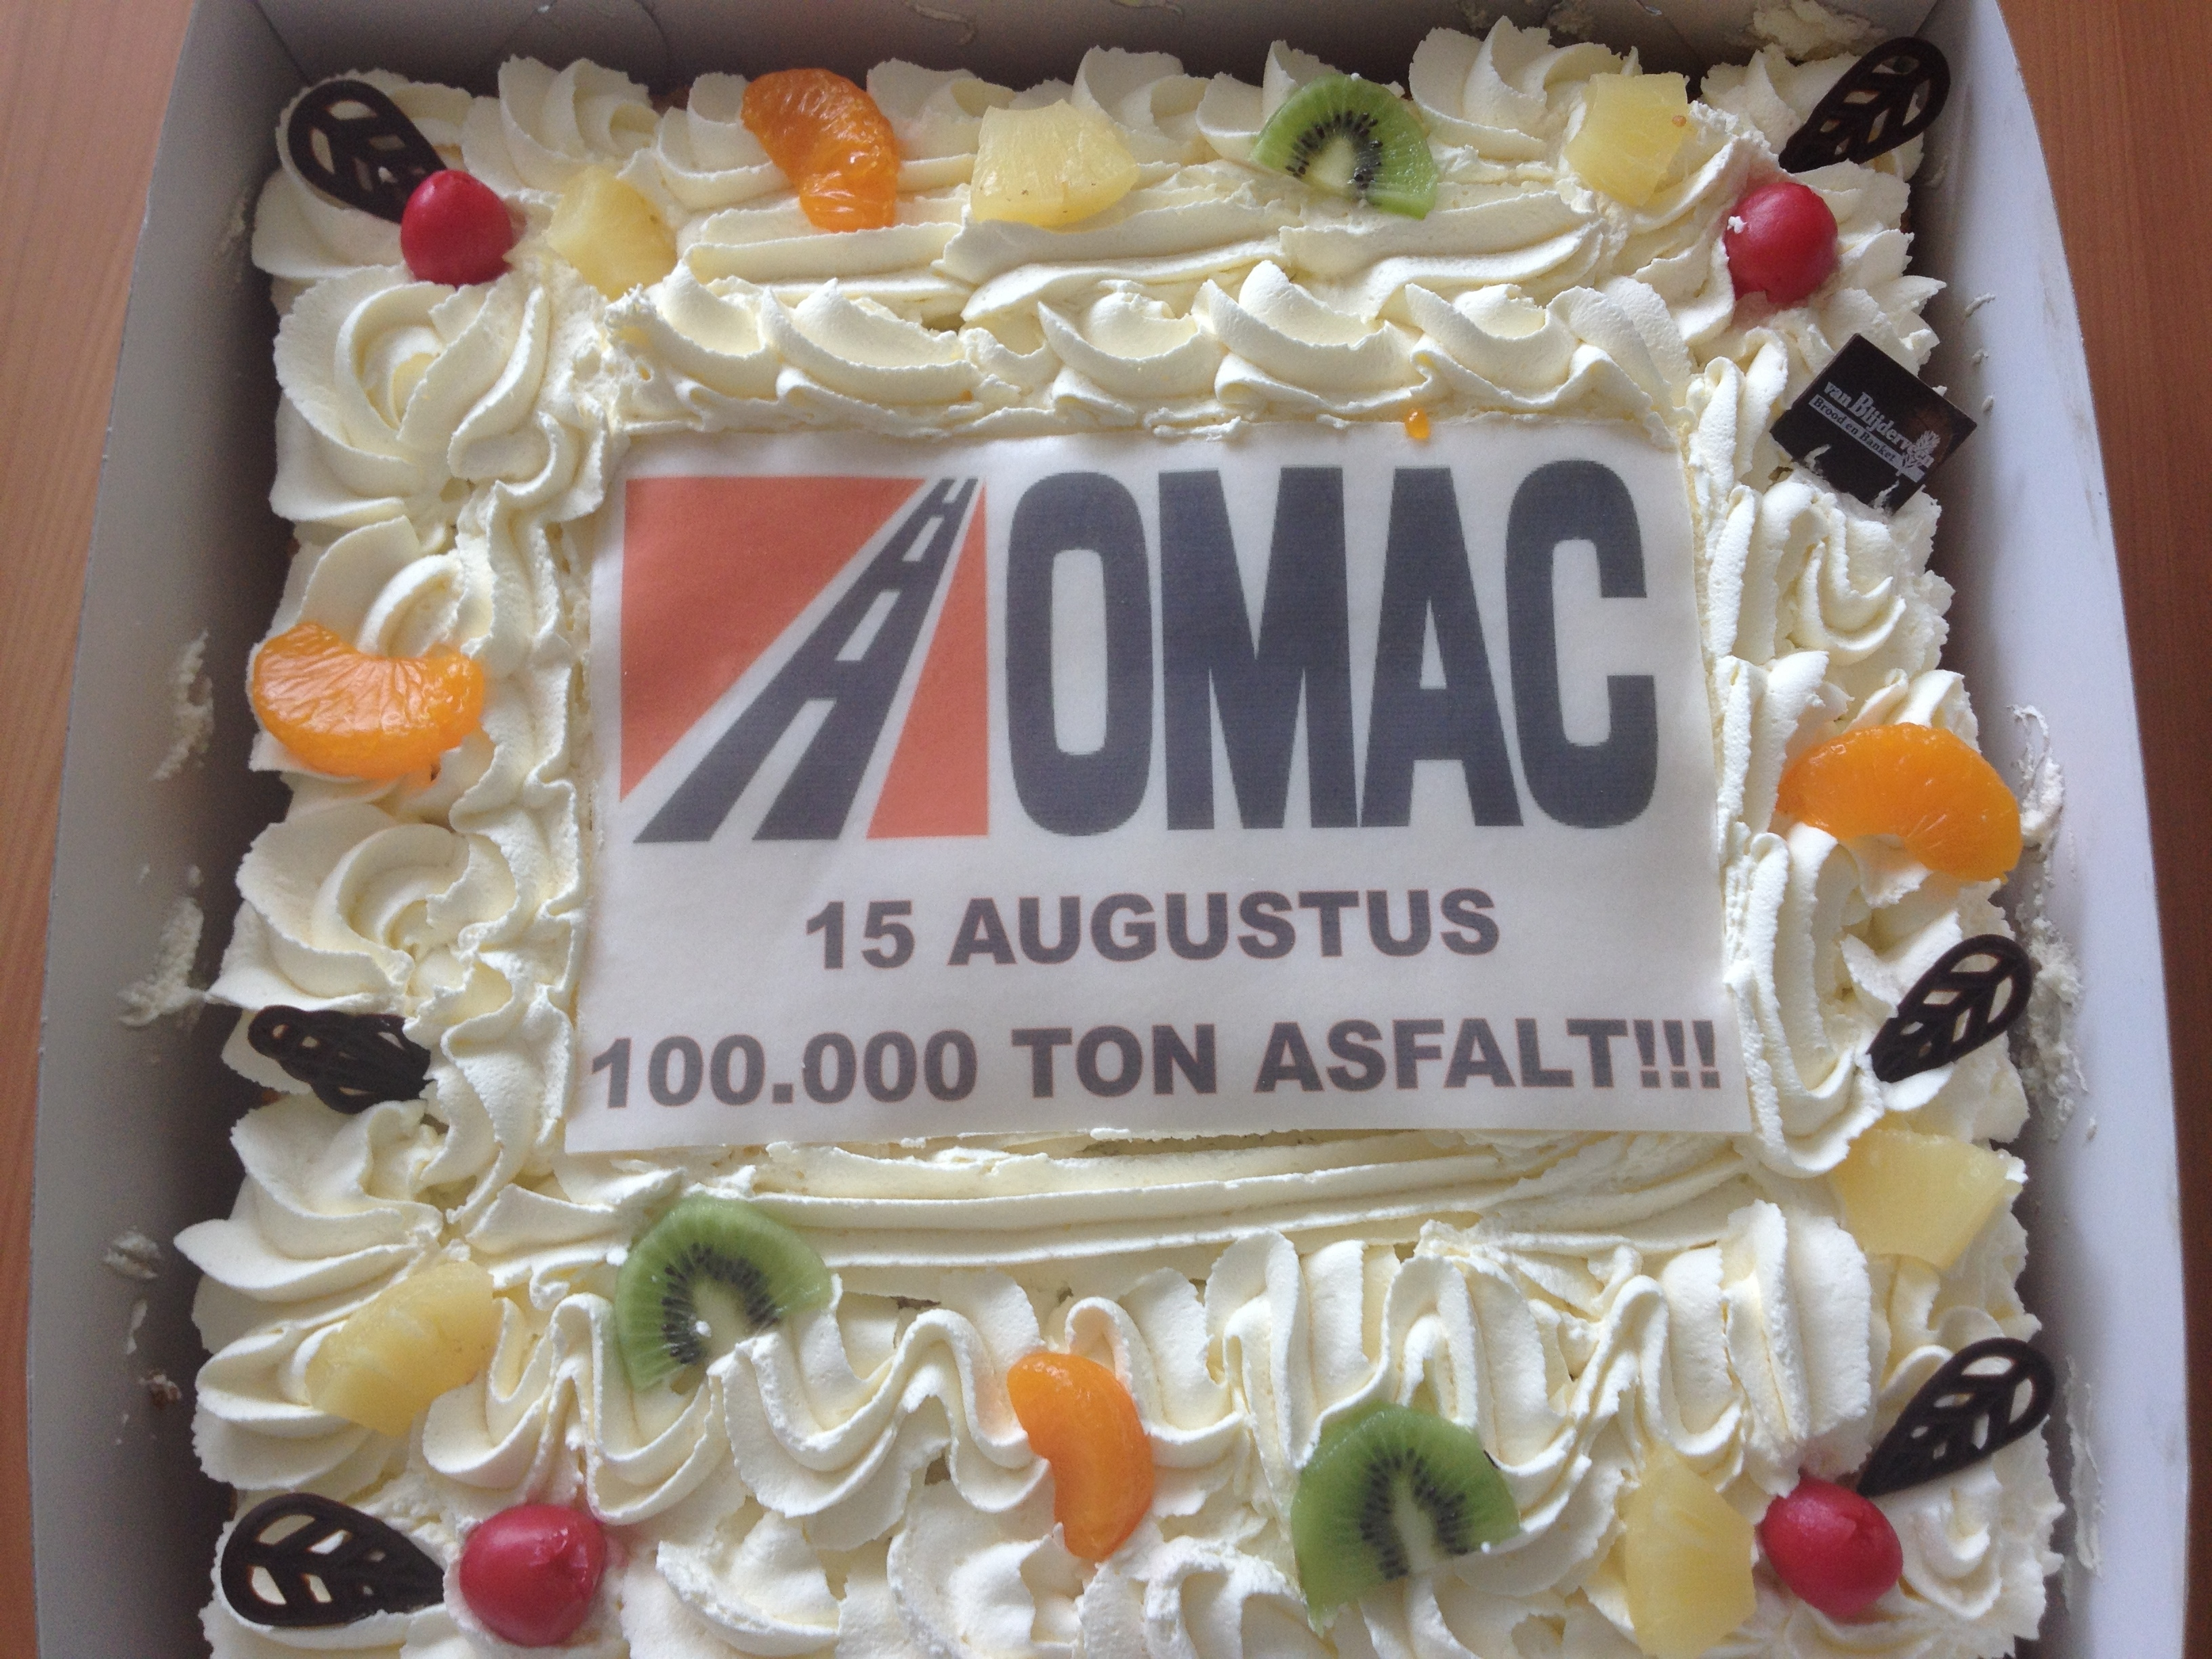 100.000 ton asfaltverwerking weer gerealiseerd